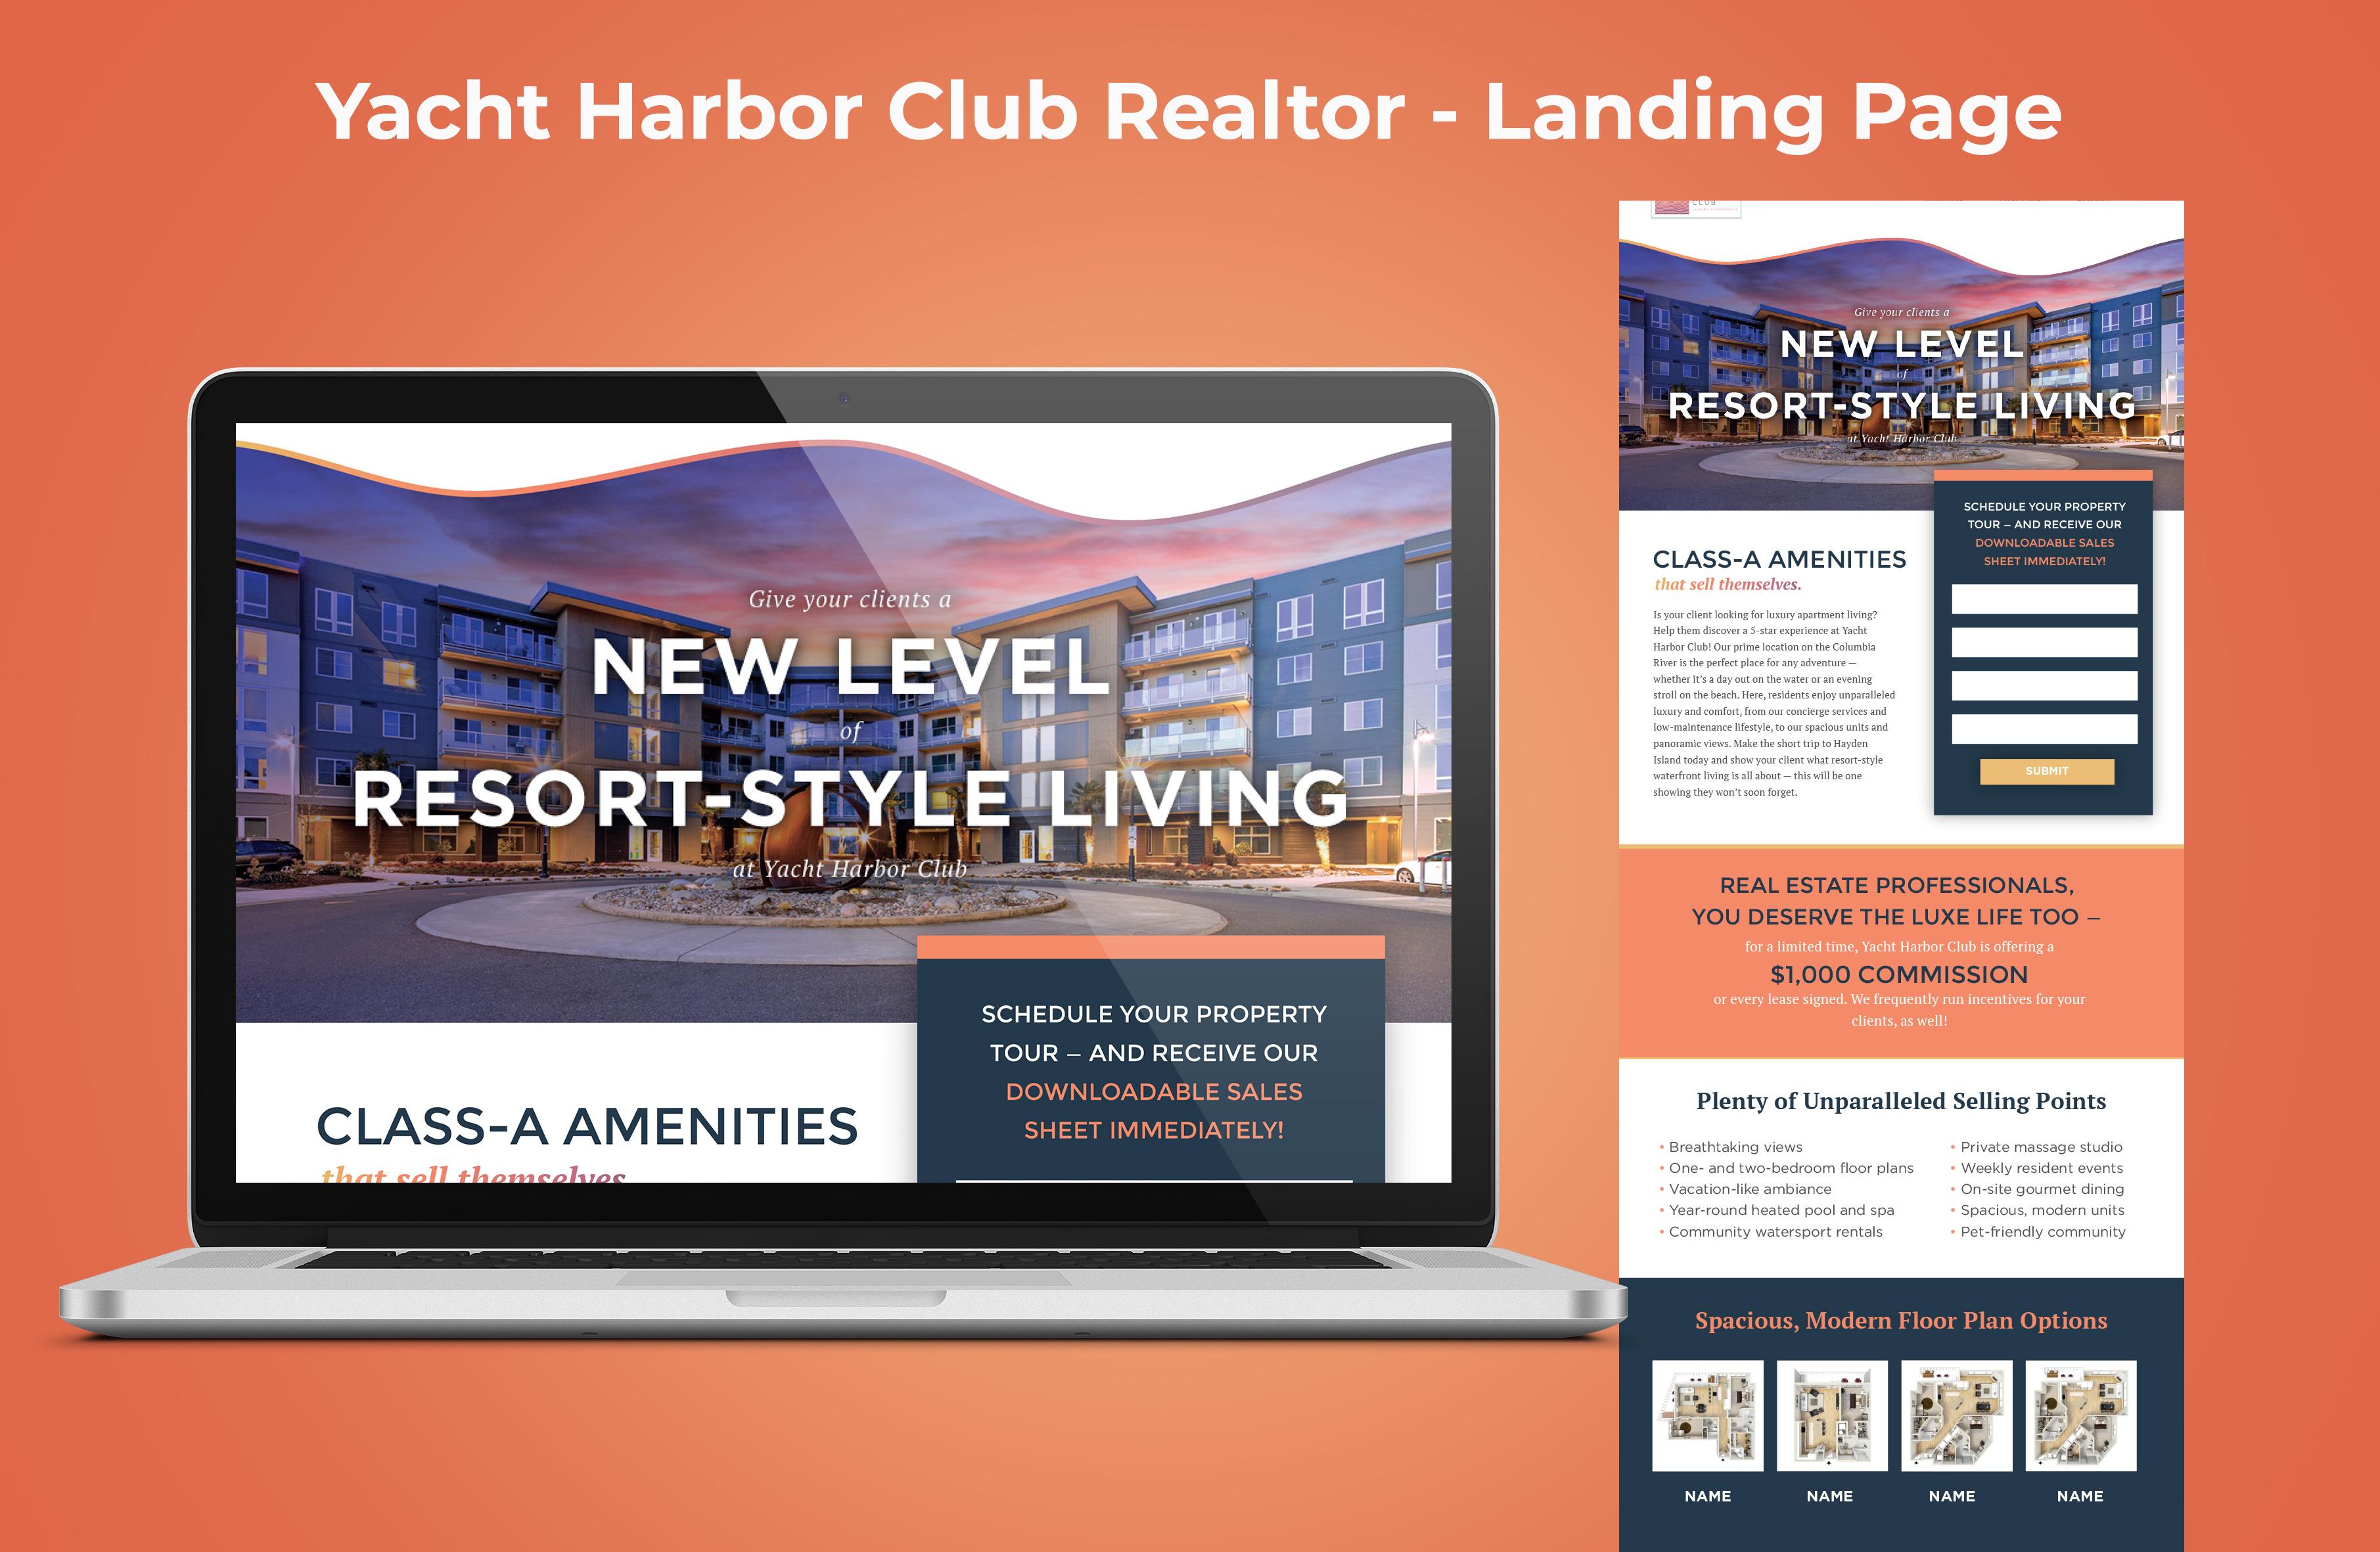 Yacht Harbor Club Realtor Landing Page Graphic